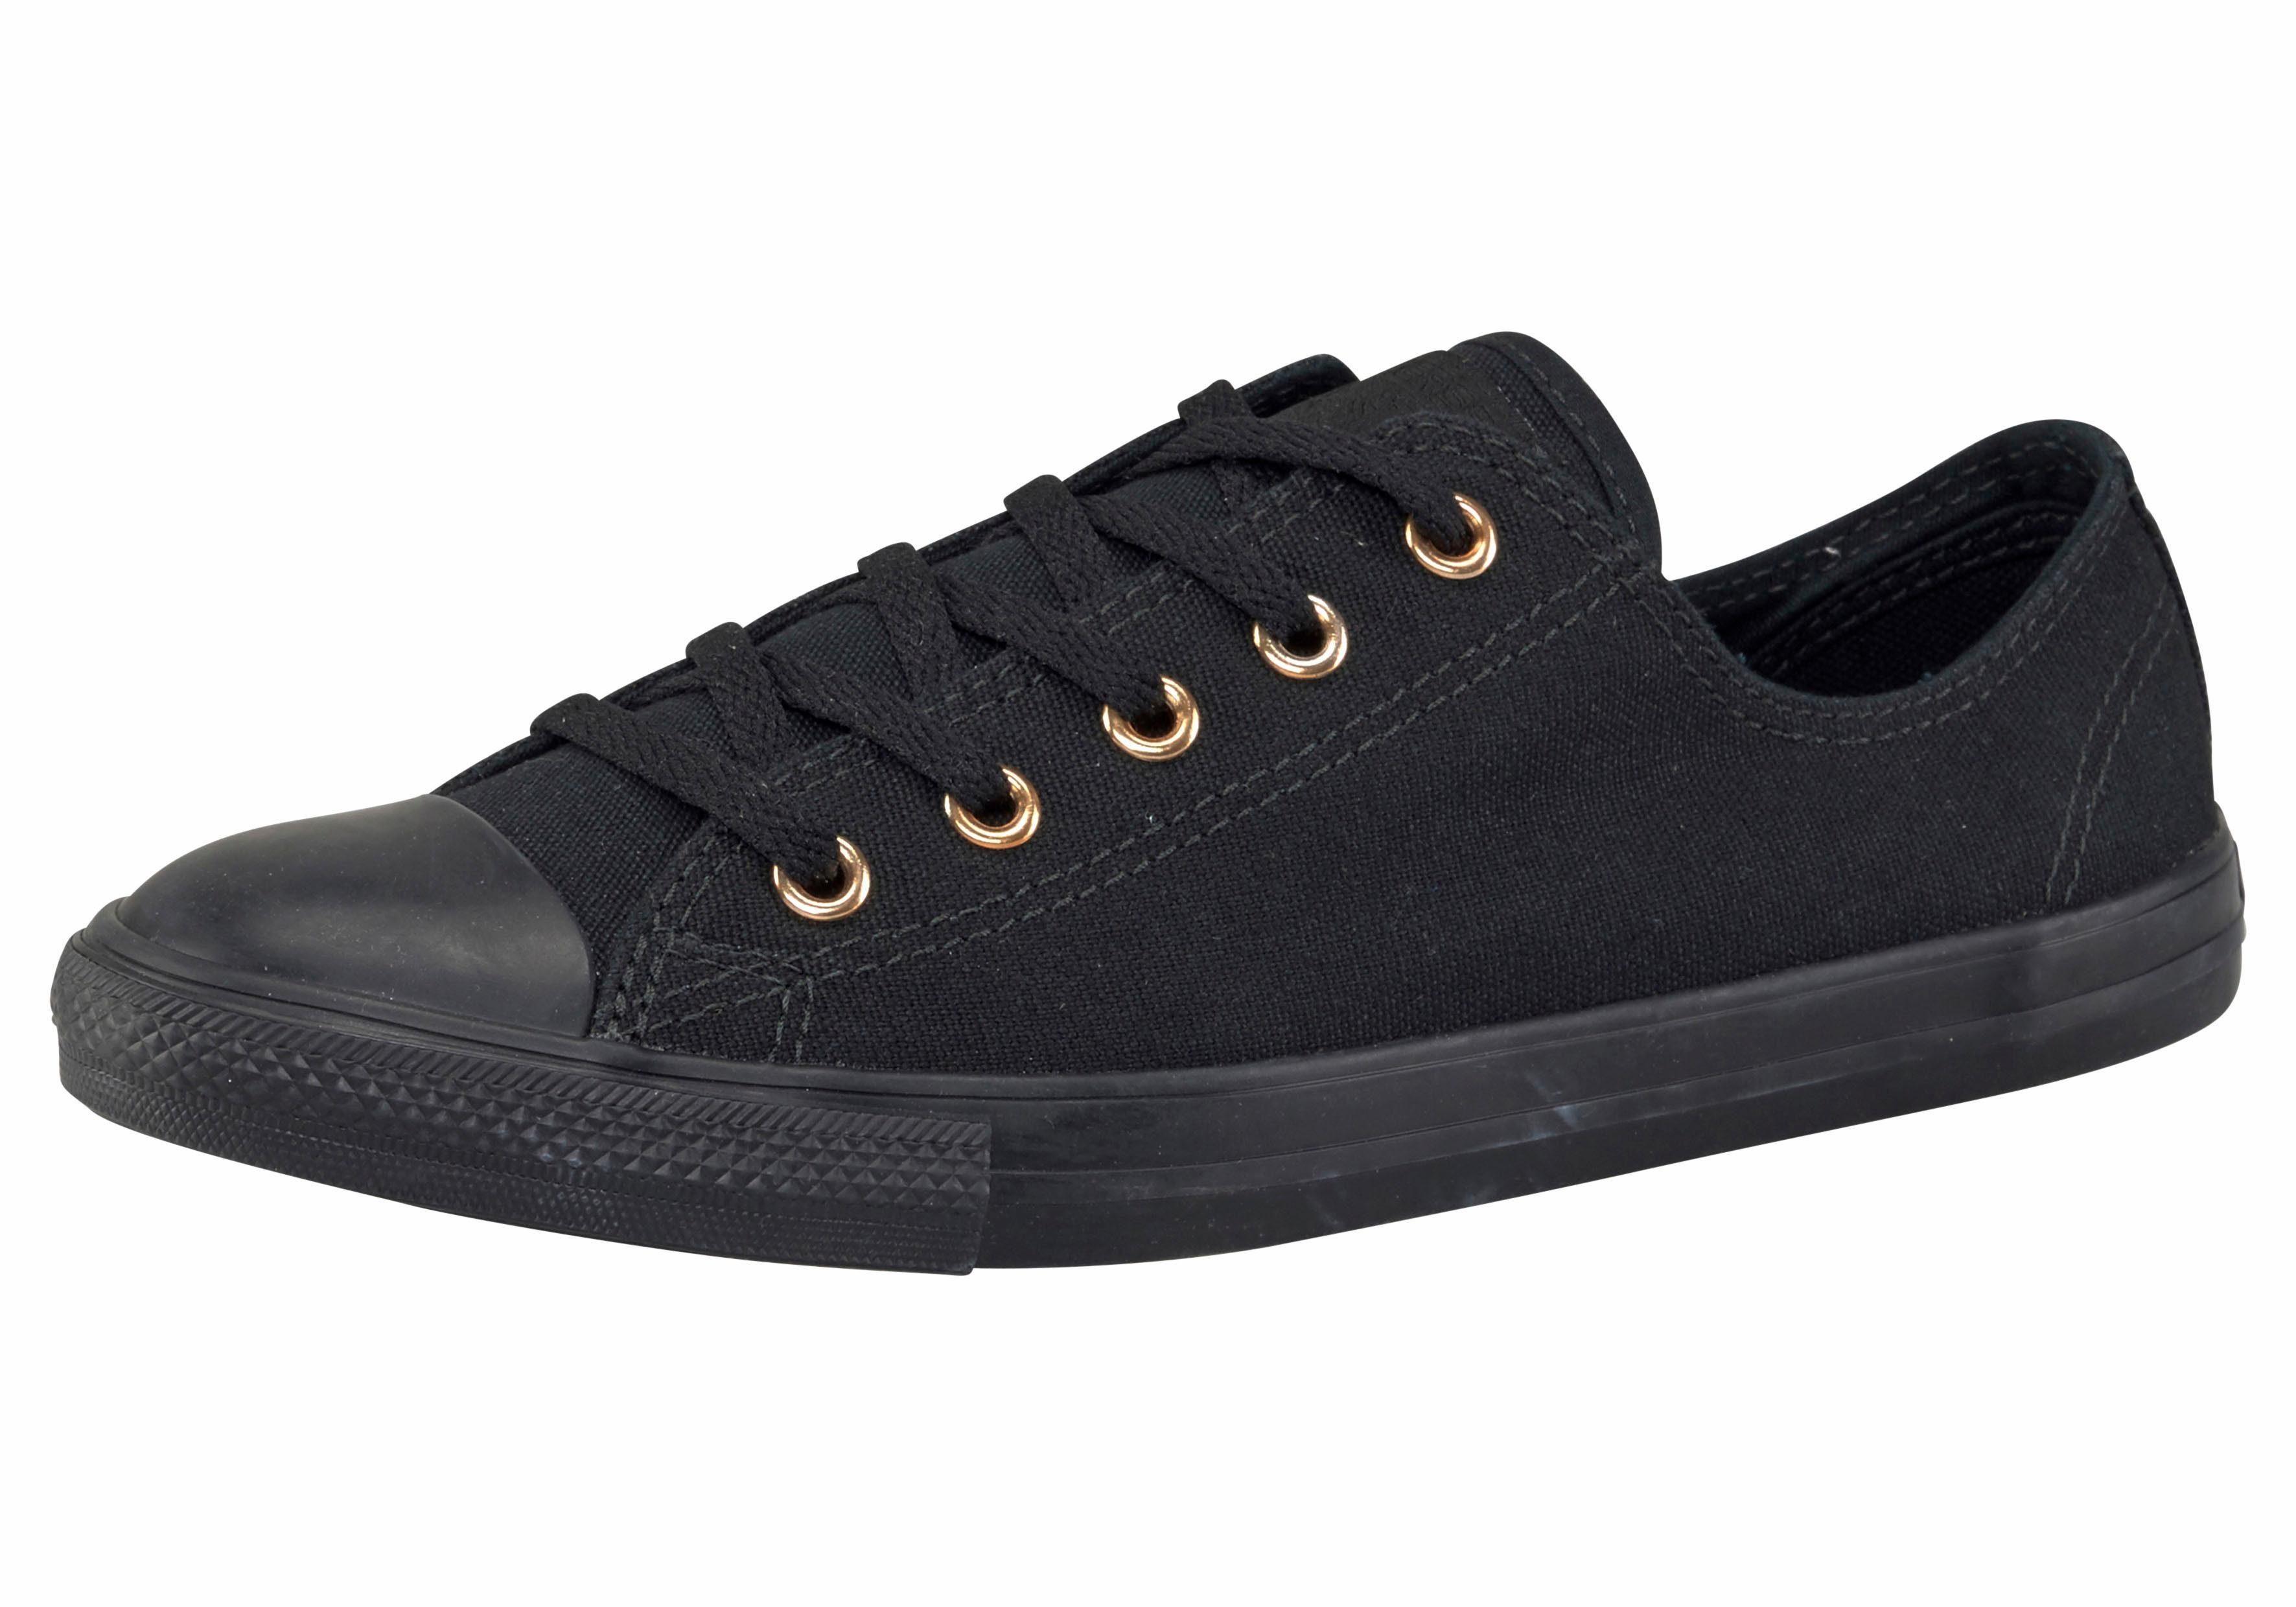 Converse Chuck Taylor All Star Dainty Ox Sneaker  schwarz